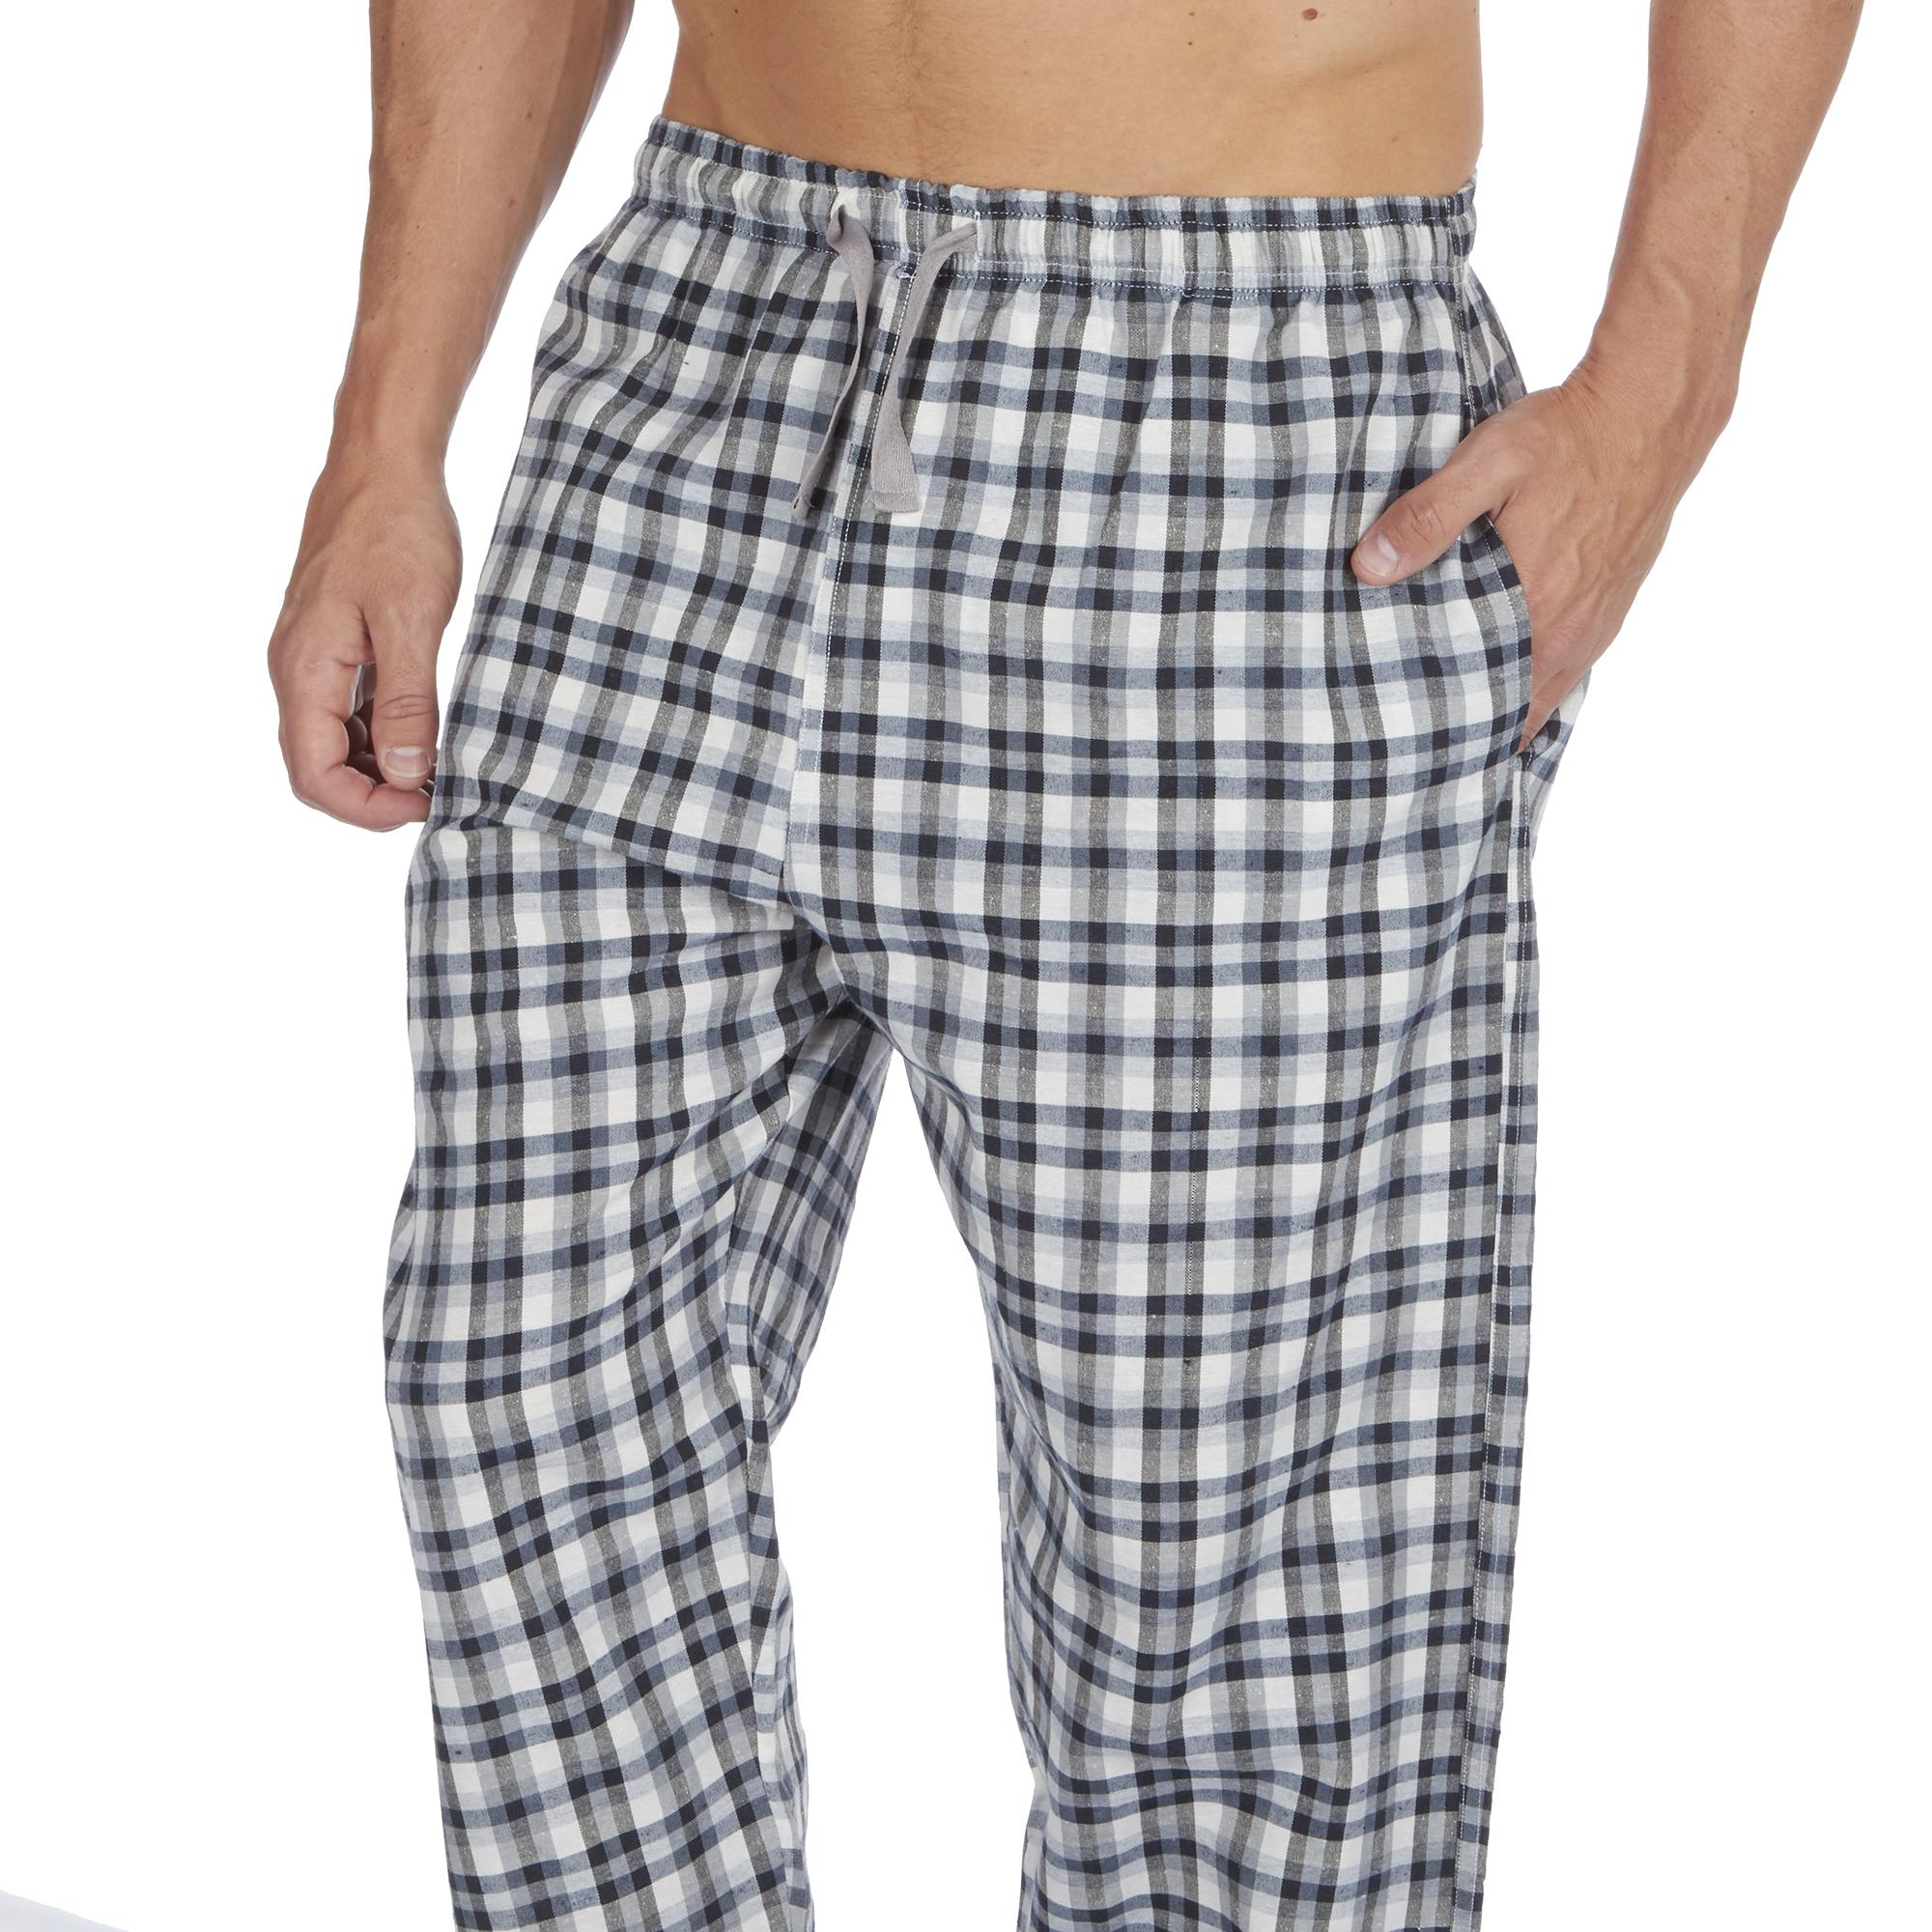 Jason-Jones-Homme-Carreaux-Tisse-Pyjama-Pantalon-en-Coton-Melange-Serge-PJ-Lounge-Pants miniature 4